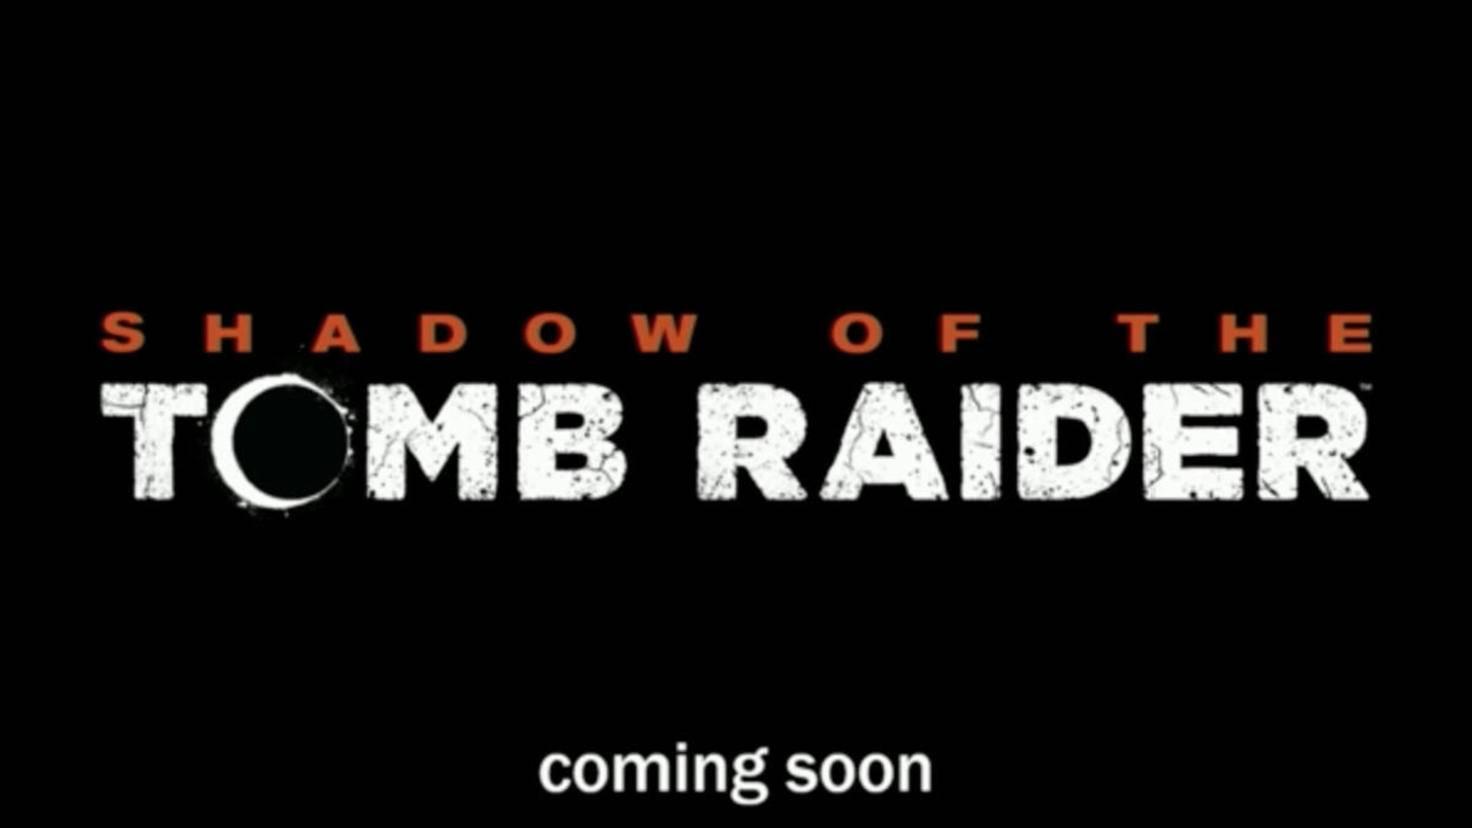 Shadow of the Tomb Raider Final Fantasy XV